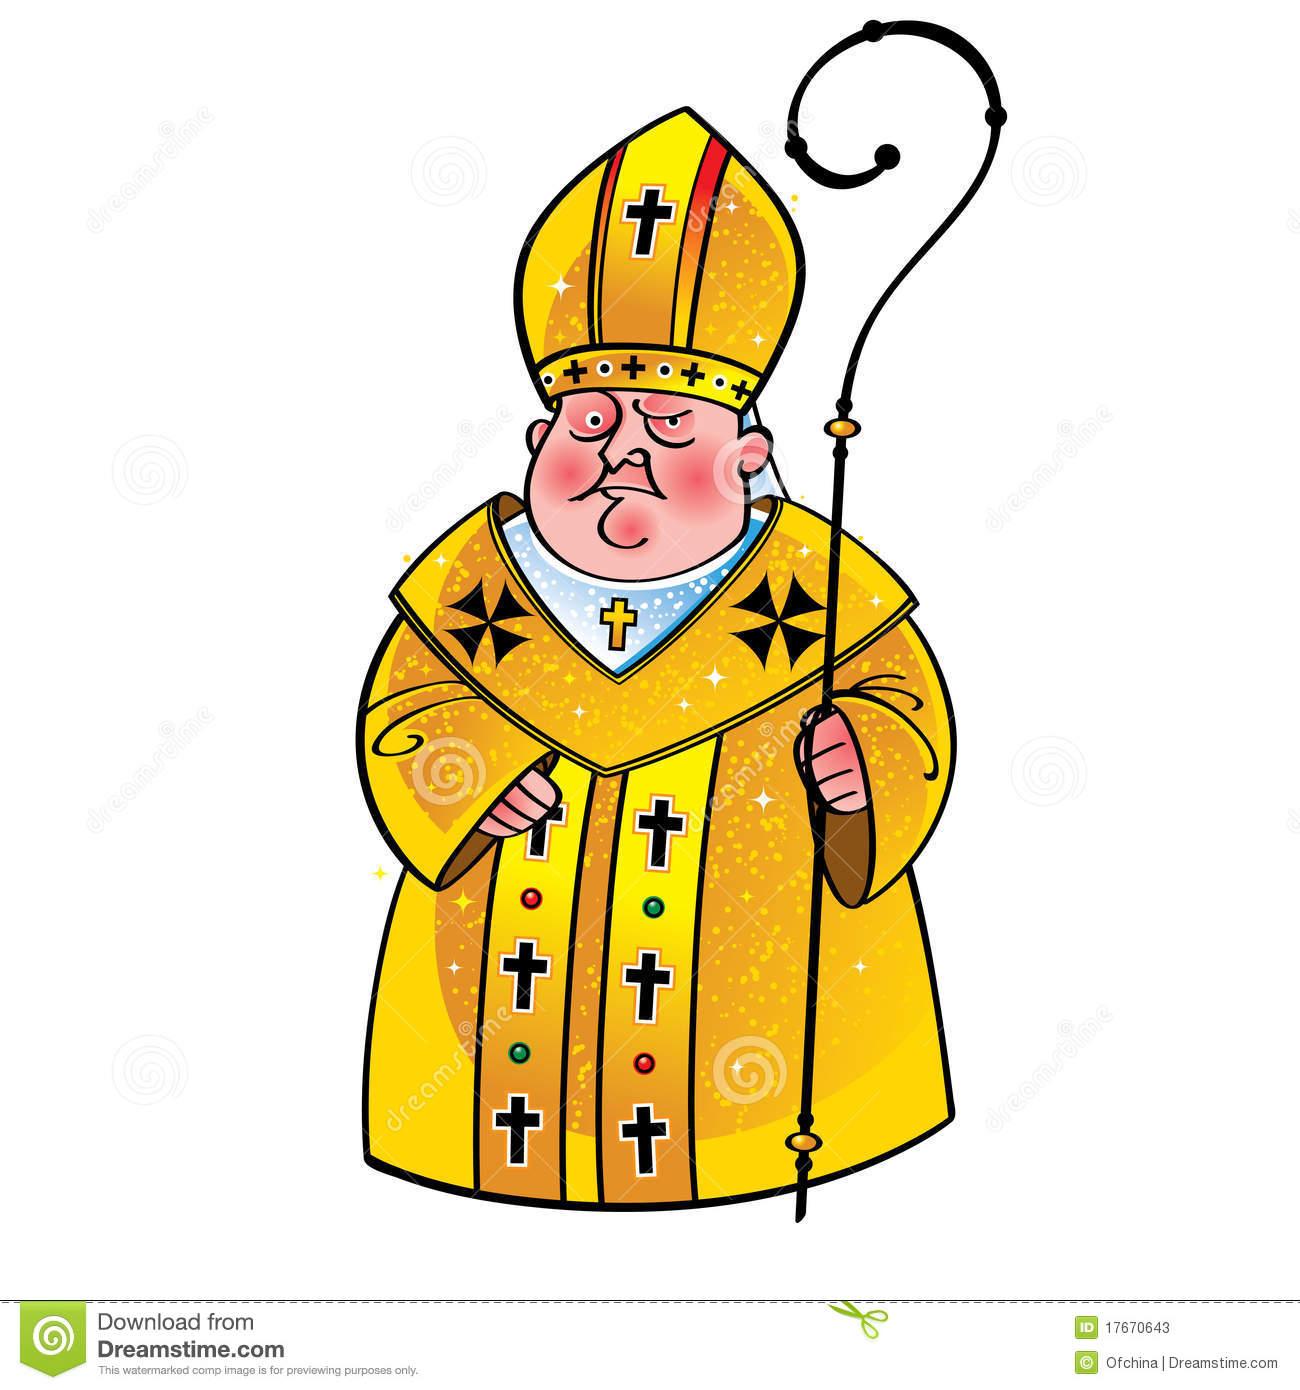 Bishops clipart #14